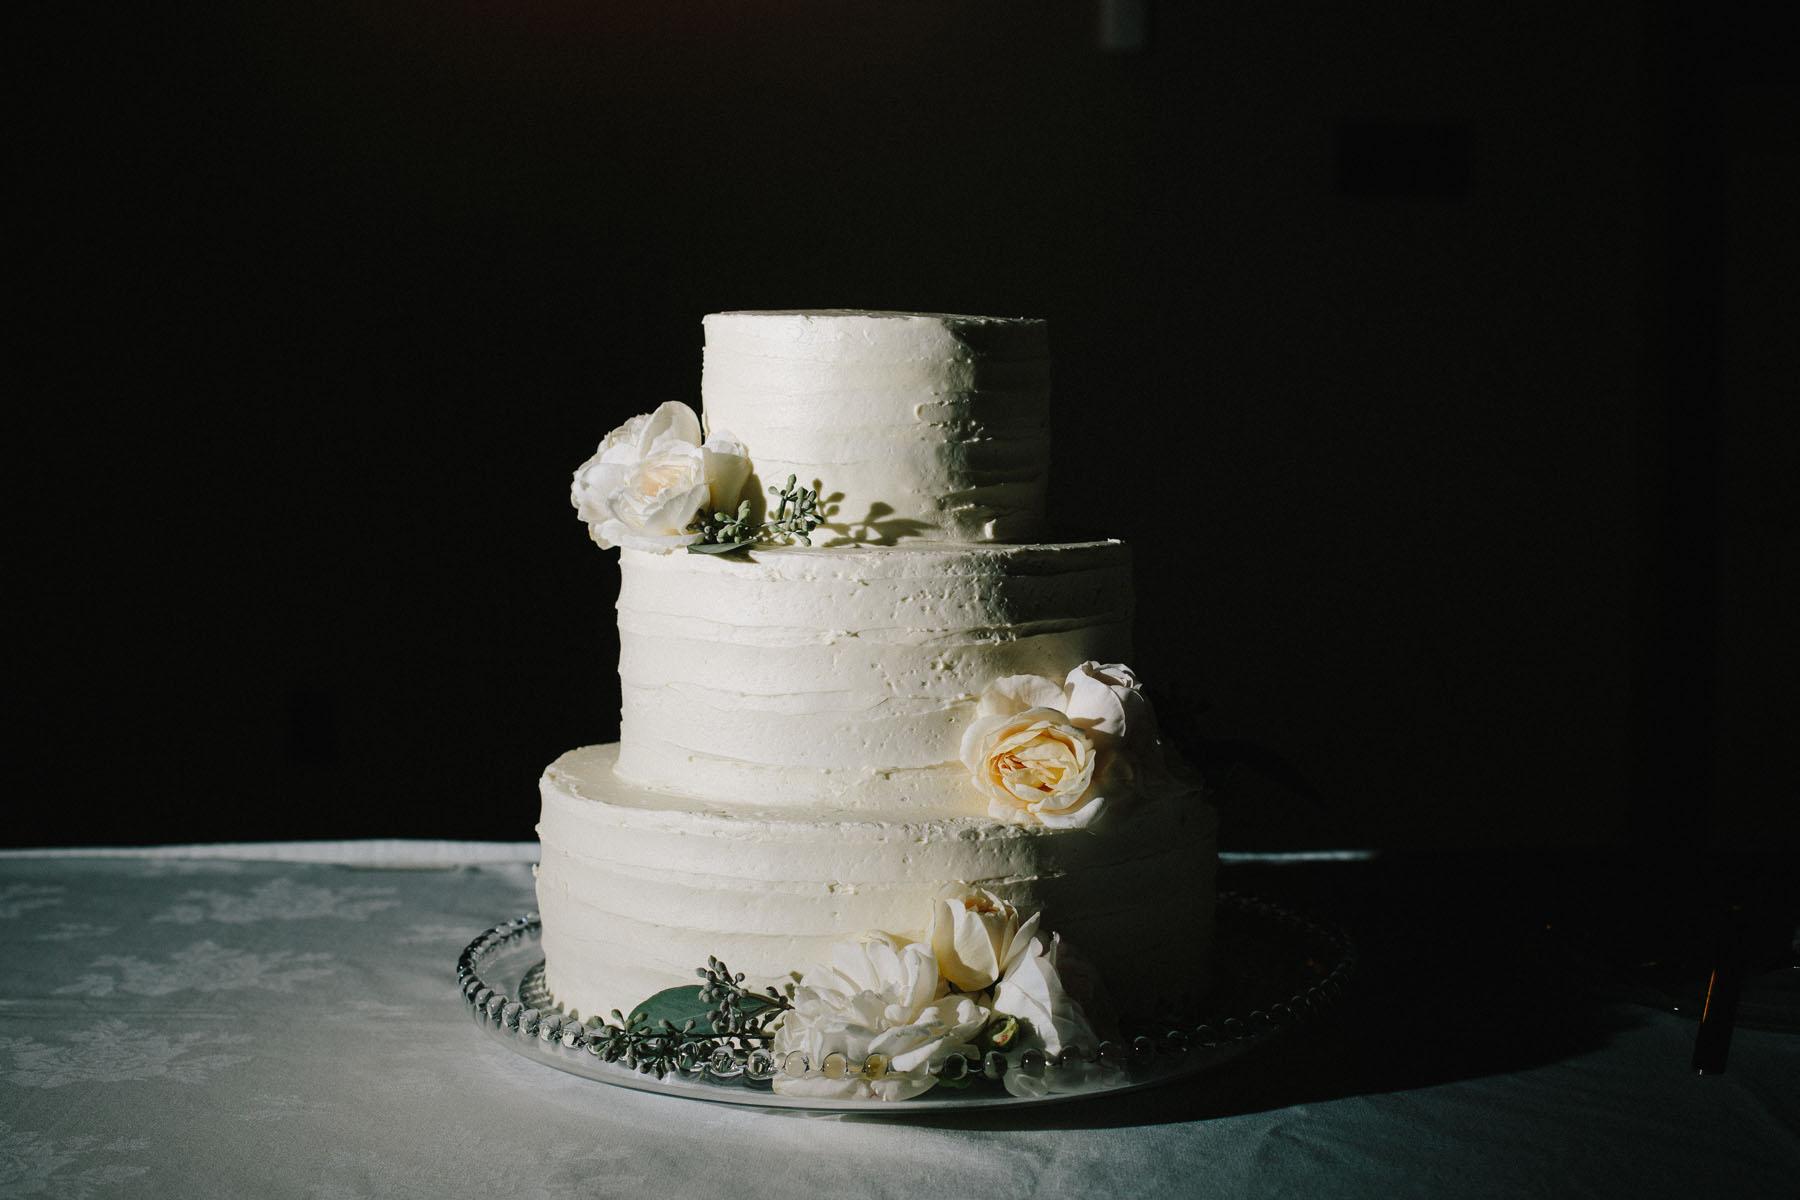 thetis-island-wedding-photographer-rp-rn-187.jpg